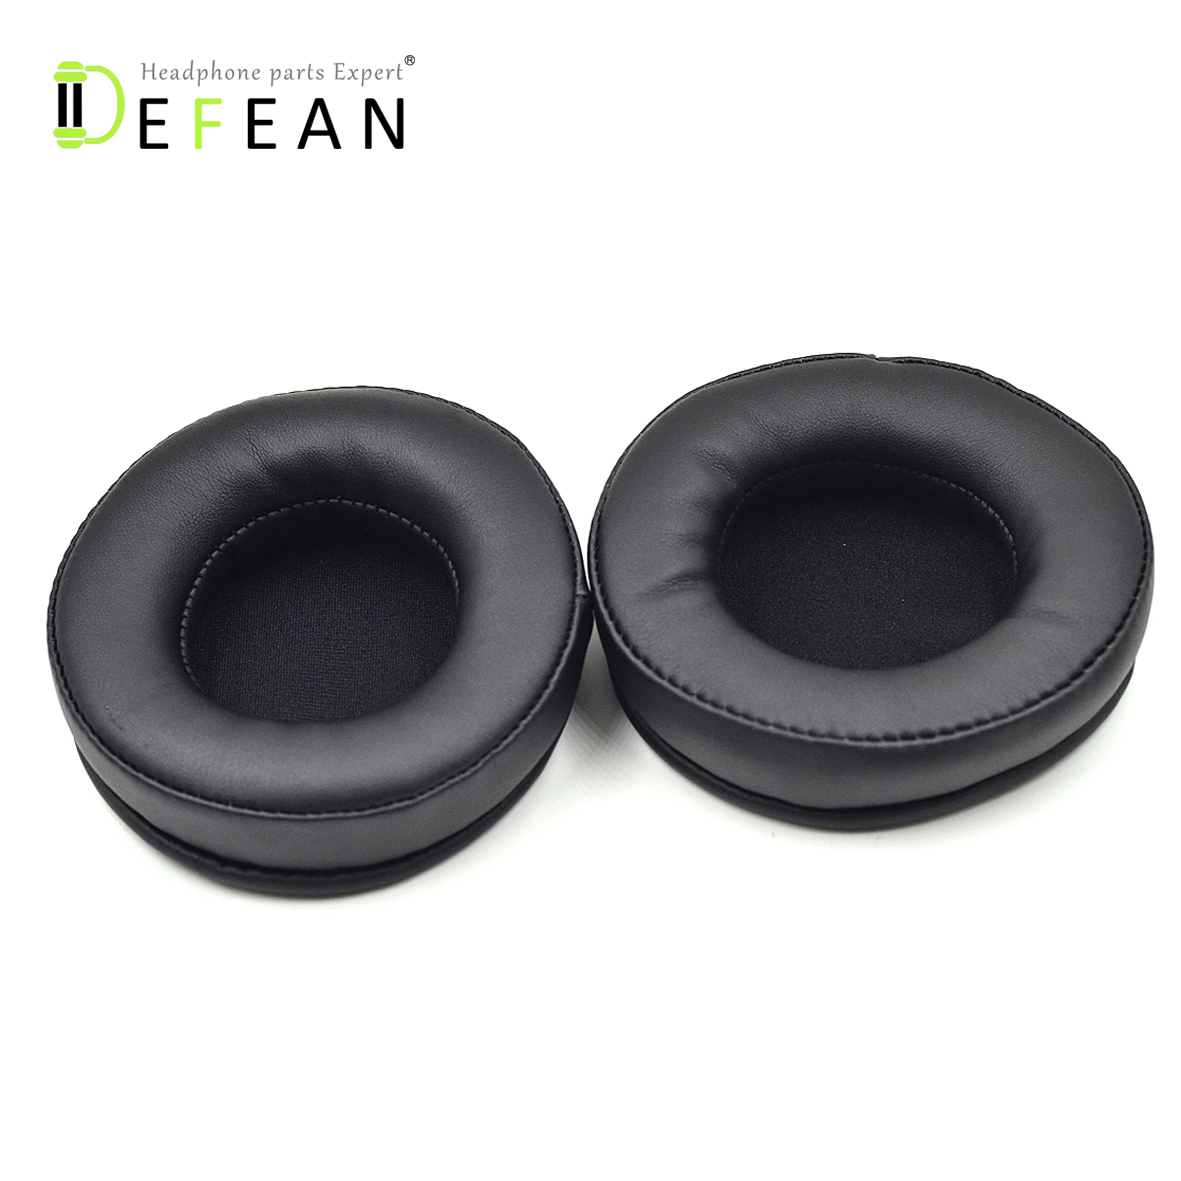 Velour Ear pads earpads cushion for Pioneer HDJ1000 HDJ2000 HDJ-1000 Headphones